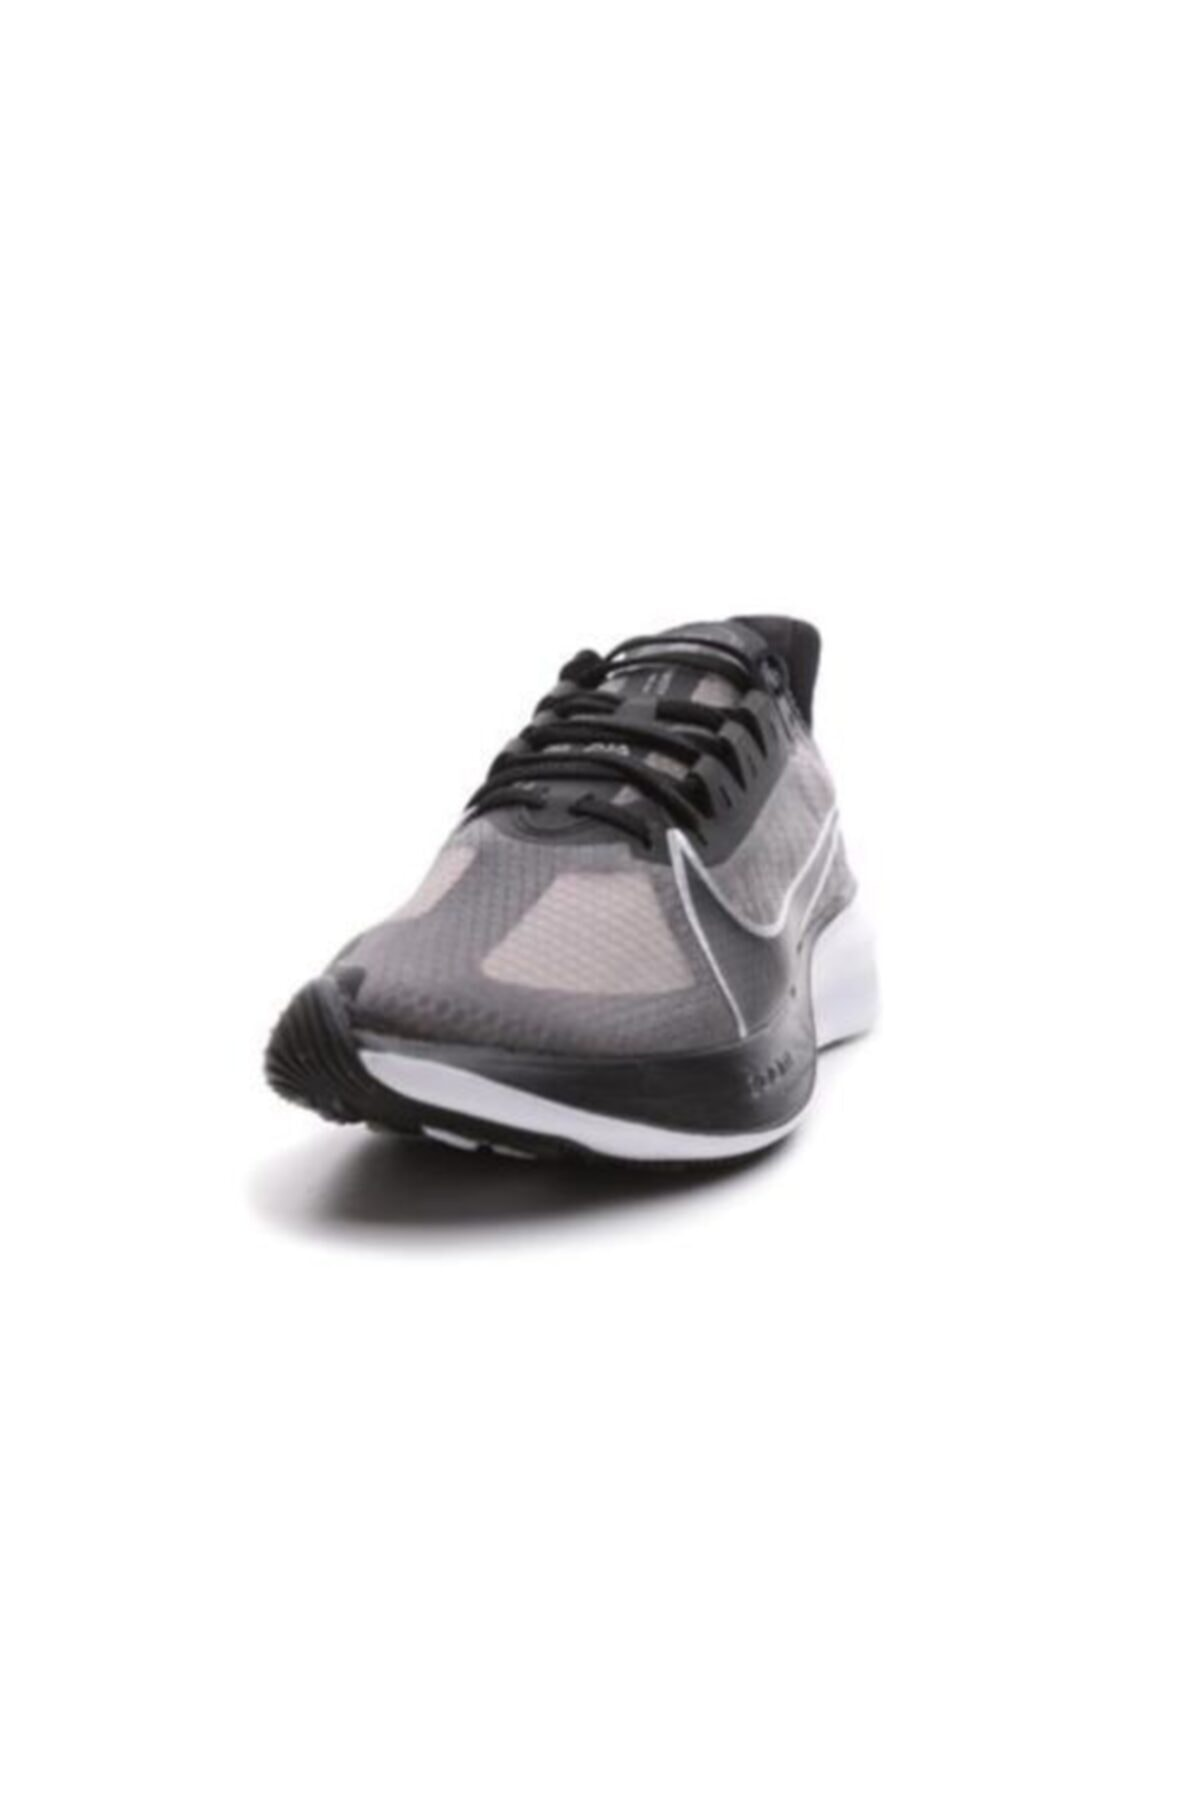 Nike Zoom Gravity Icon Running Unisex Spor Ayakkabı Bq3203-002 2